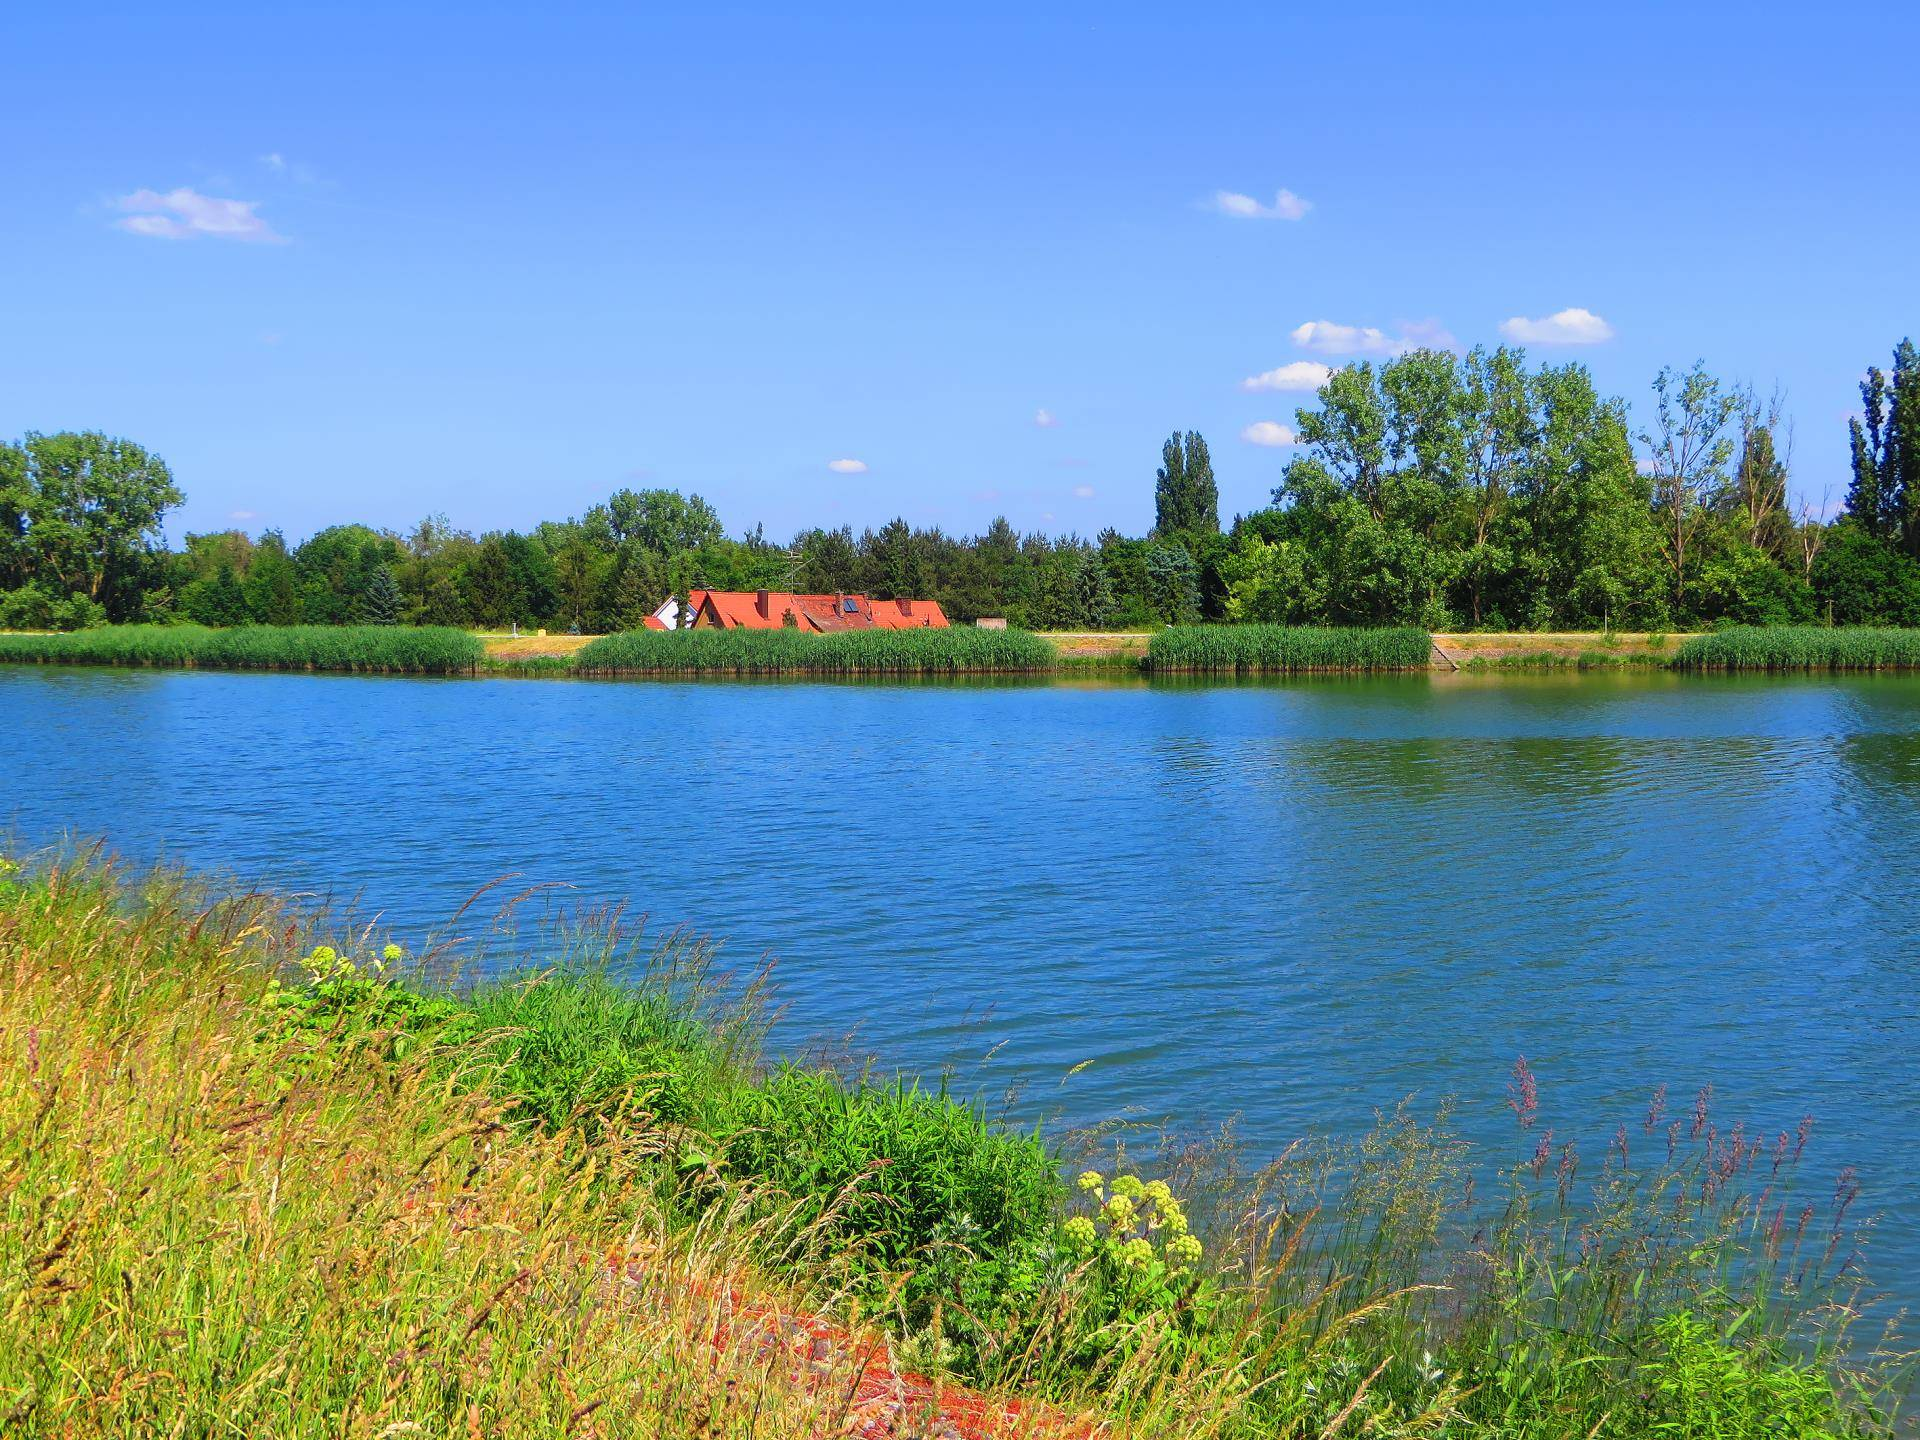 Flusskreuzfahrt: Rhein-Main-Donau-Kanal